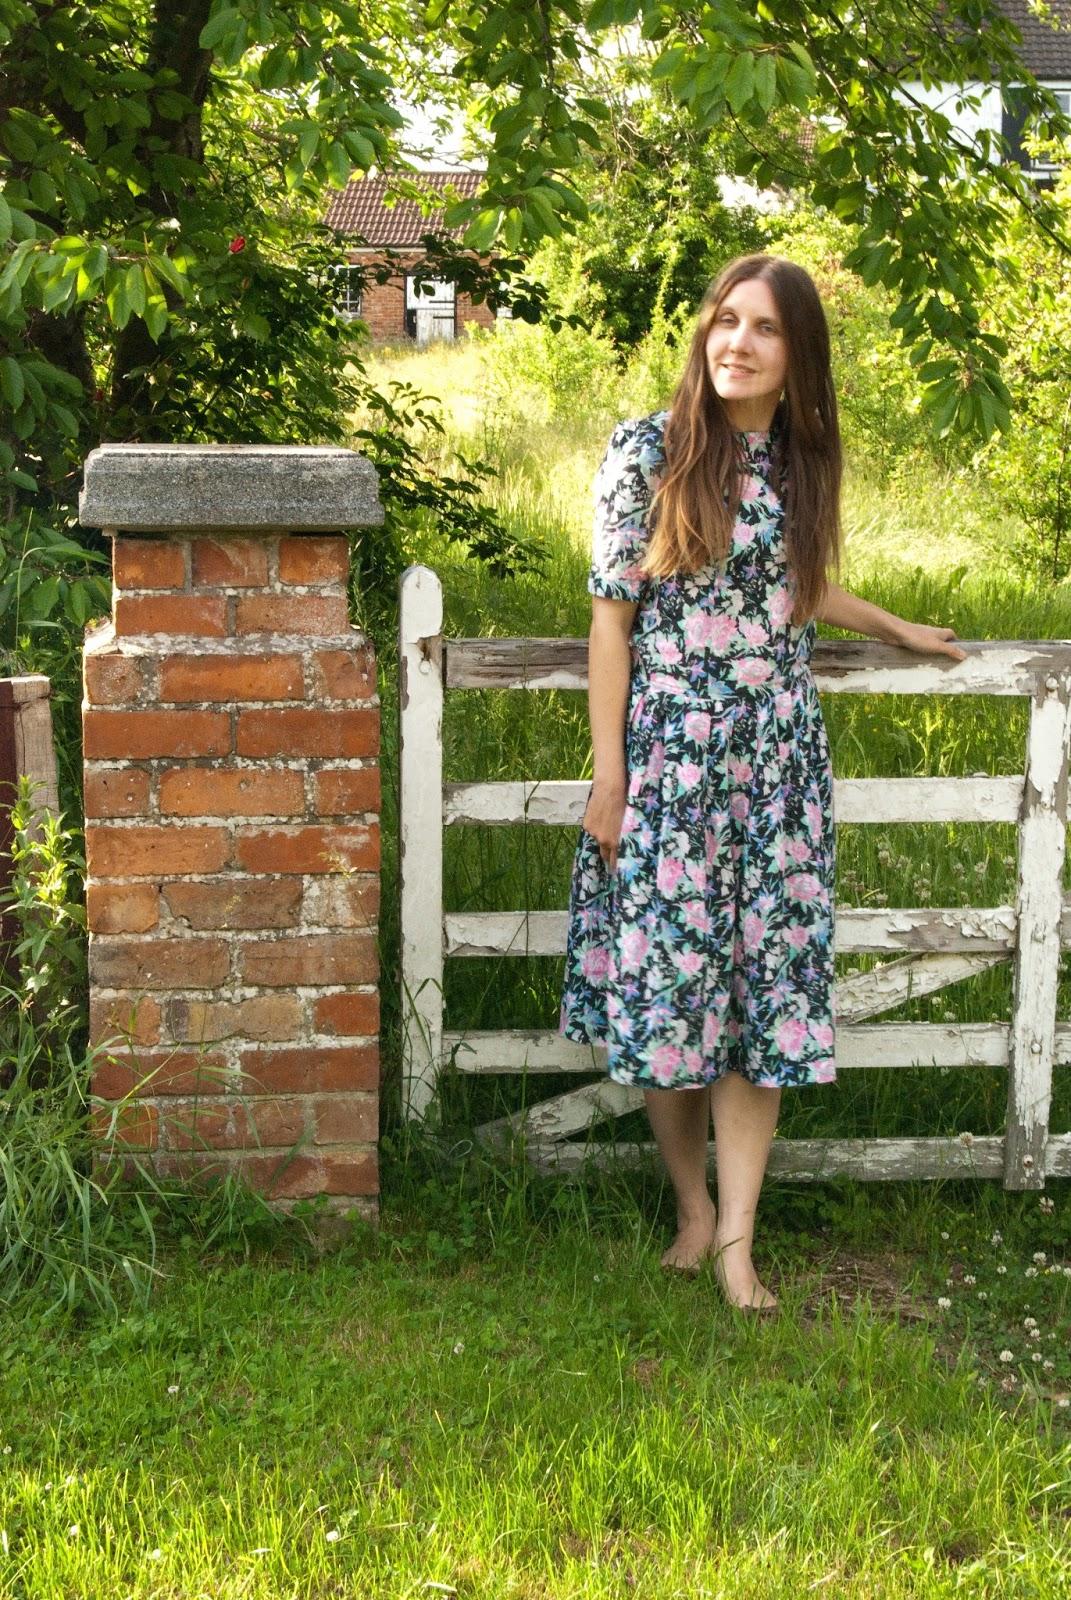 Dating laura ashley dresses